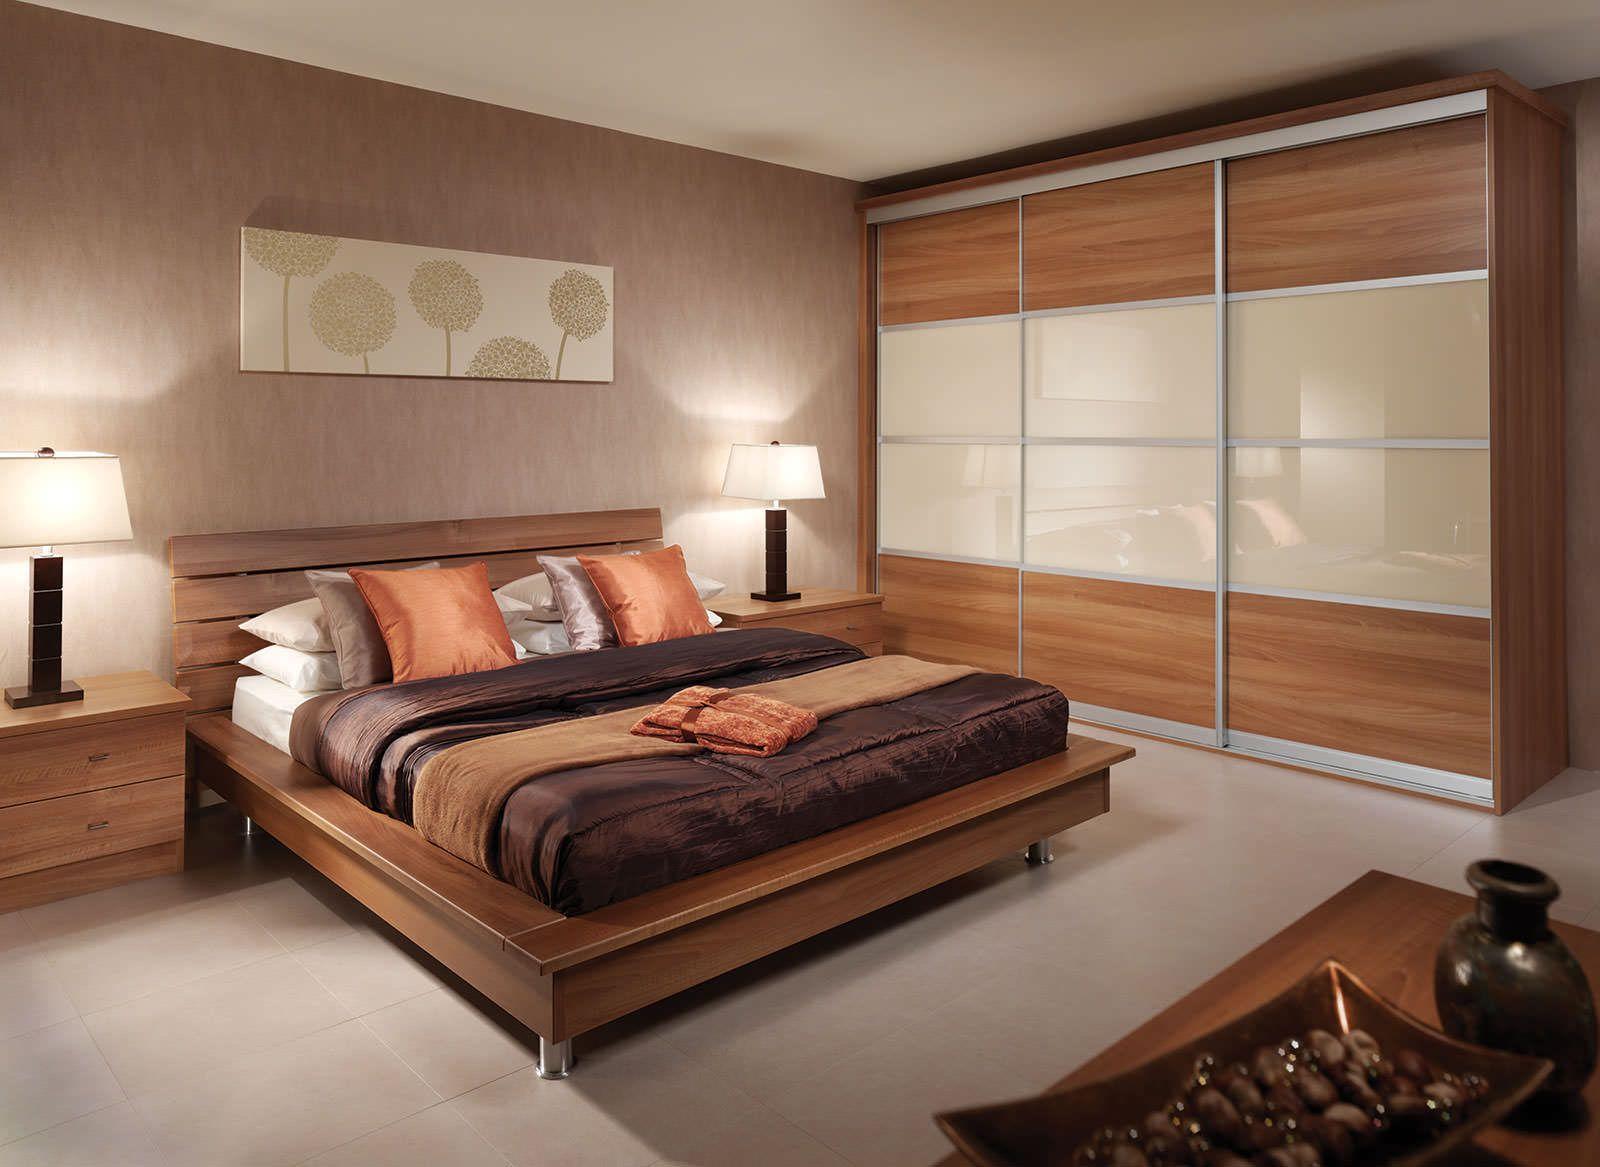 Fitted Sliding Wardrobe Doors From Strachan Sliding Door Wardrobe Designs Bedroom Furniture Design Wardrobe Design Bedroom